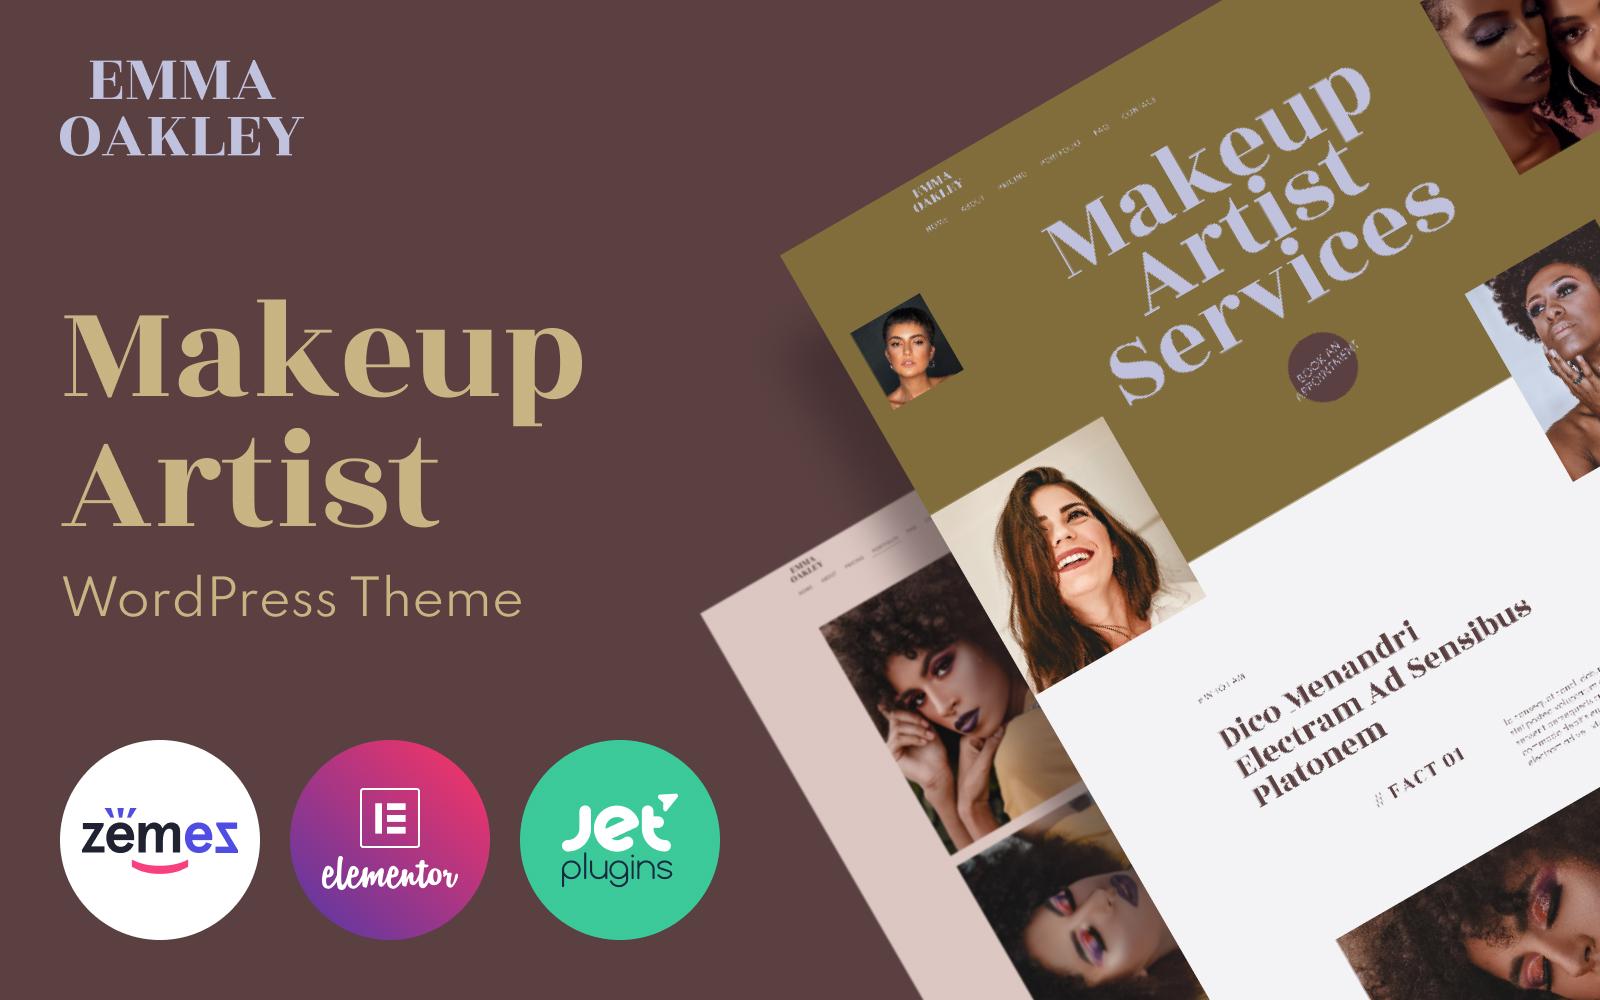 Emma Oakley - Makeup Artist WordPress Theme